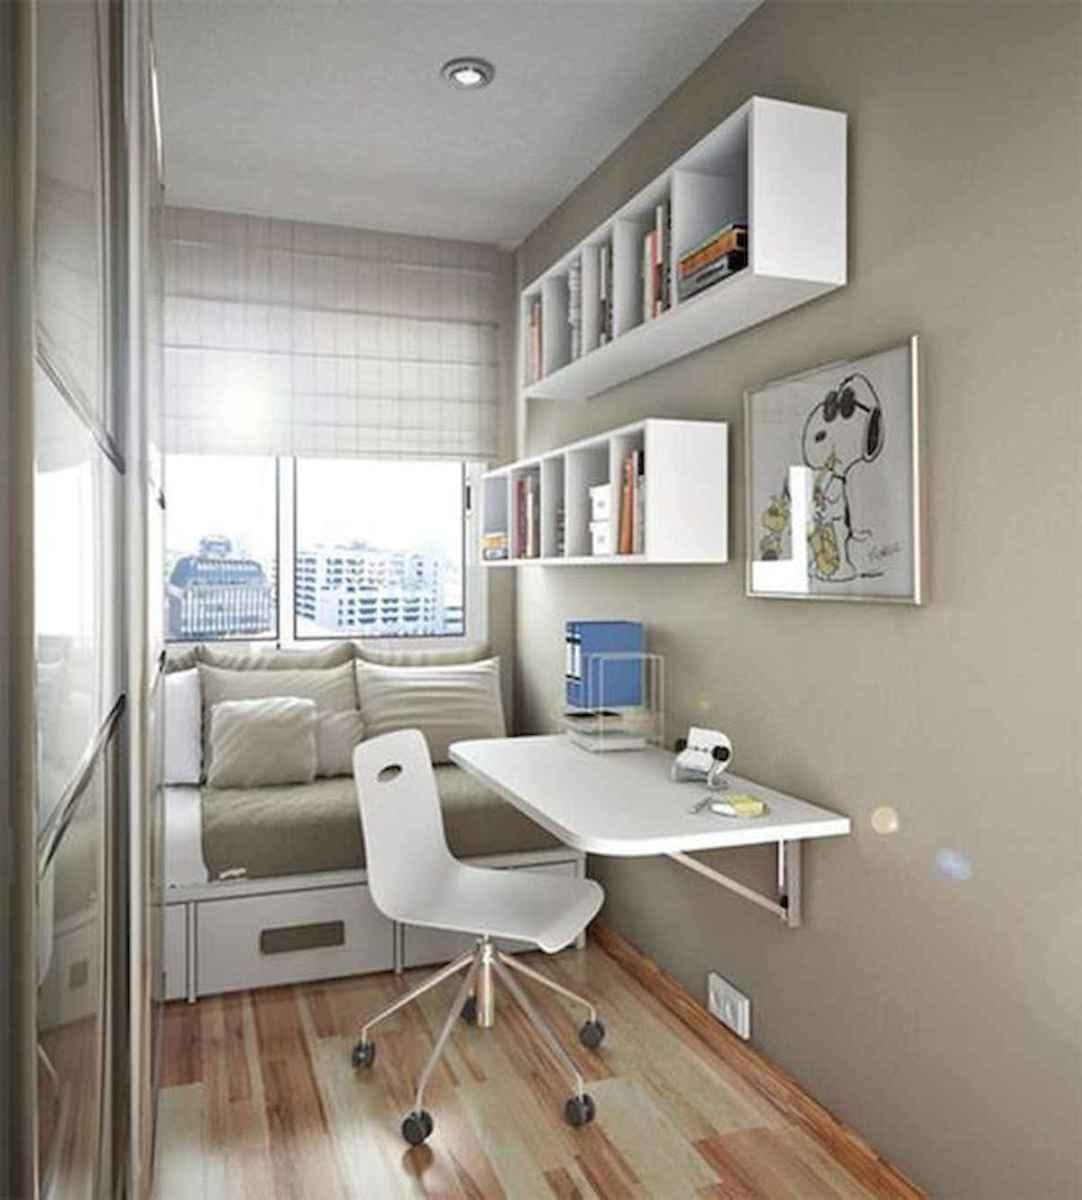 80 Fantastic Small Apartment Bedroom College Design Ideas and Decor (45)